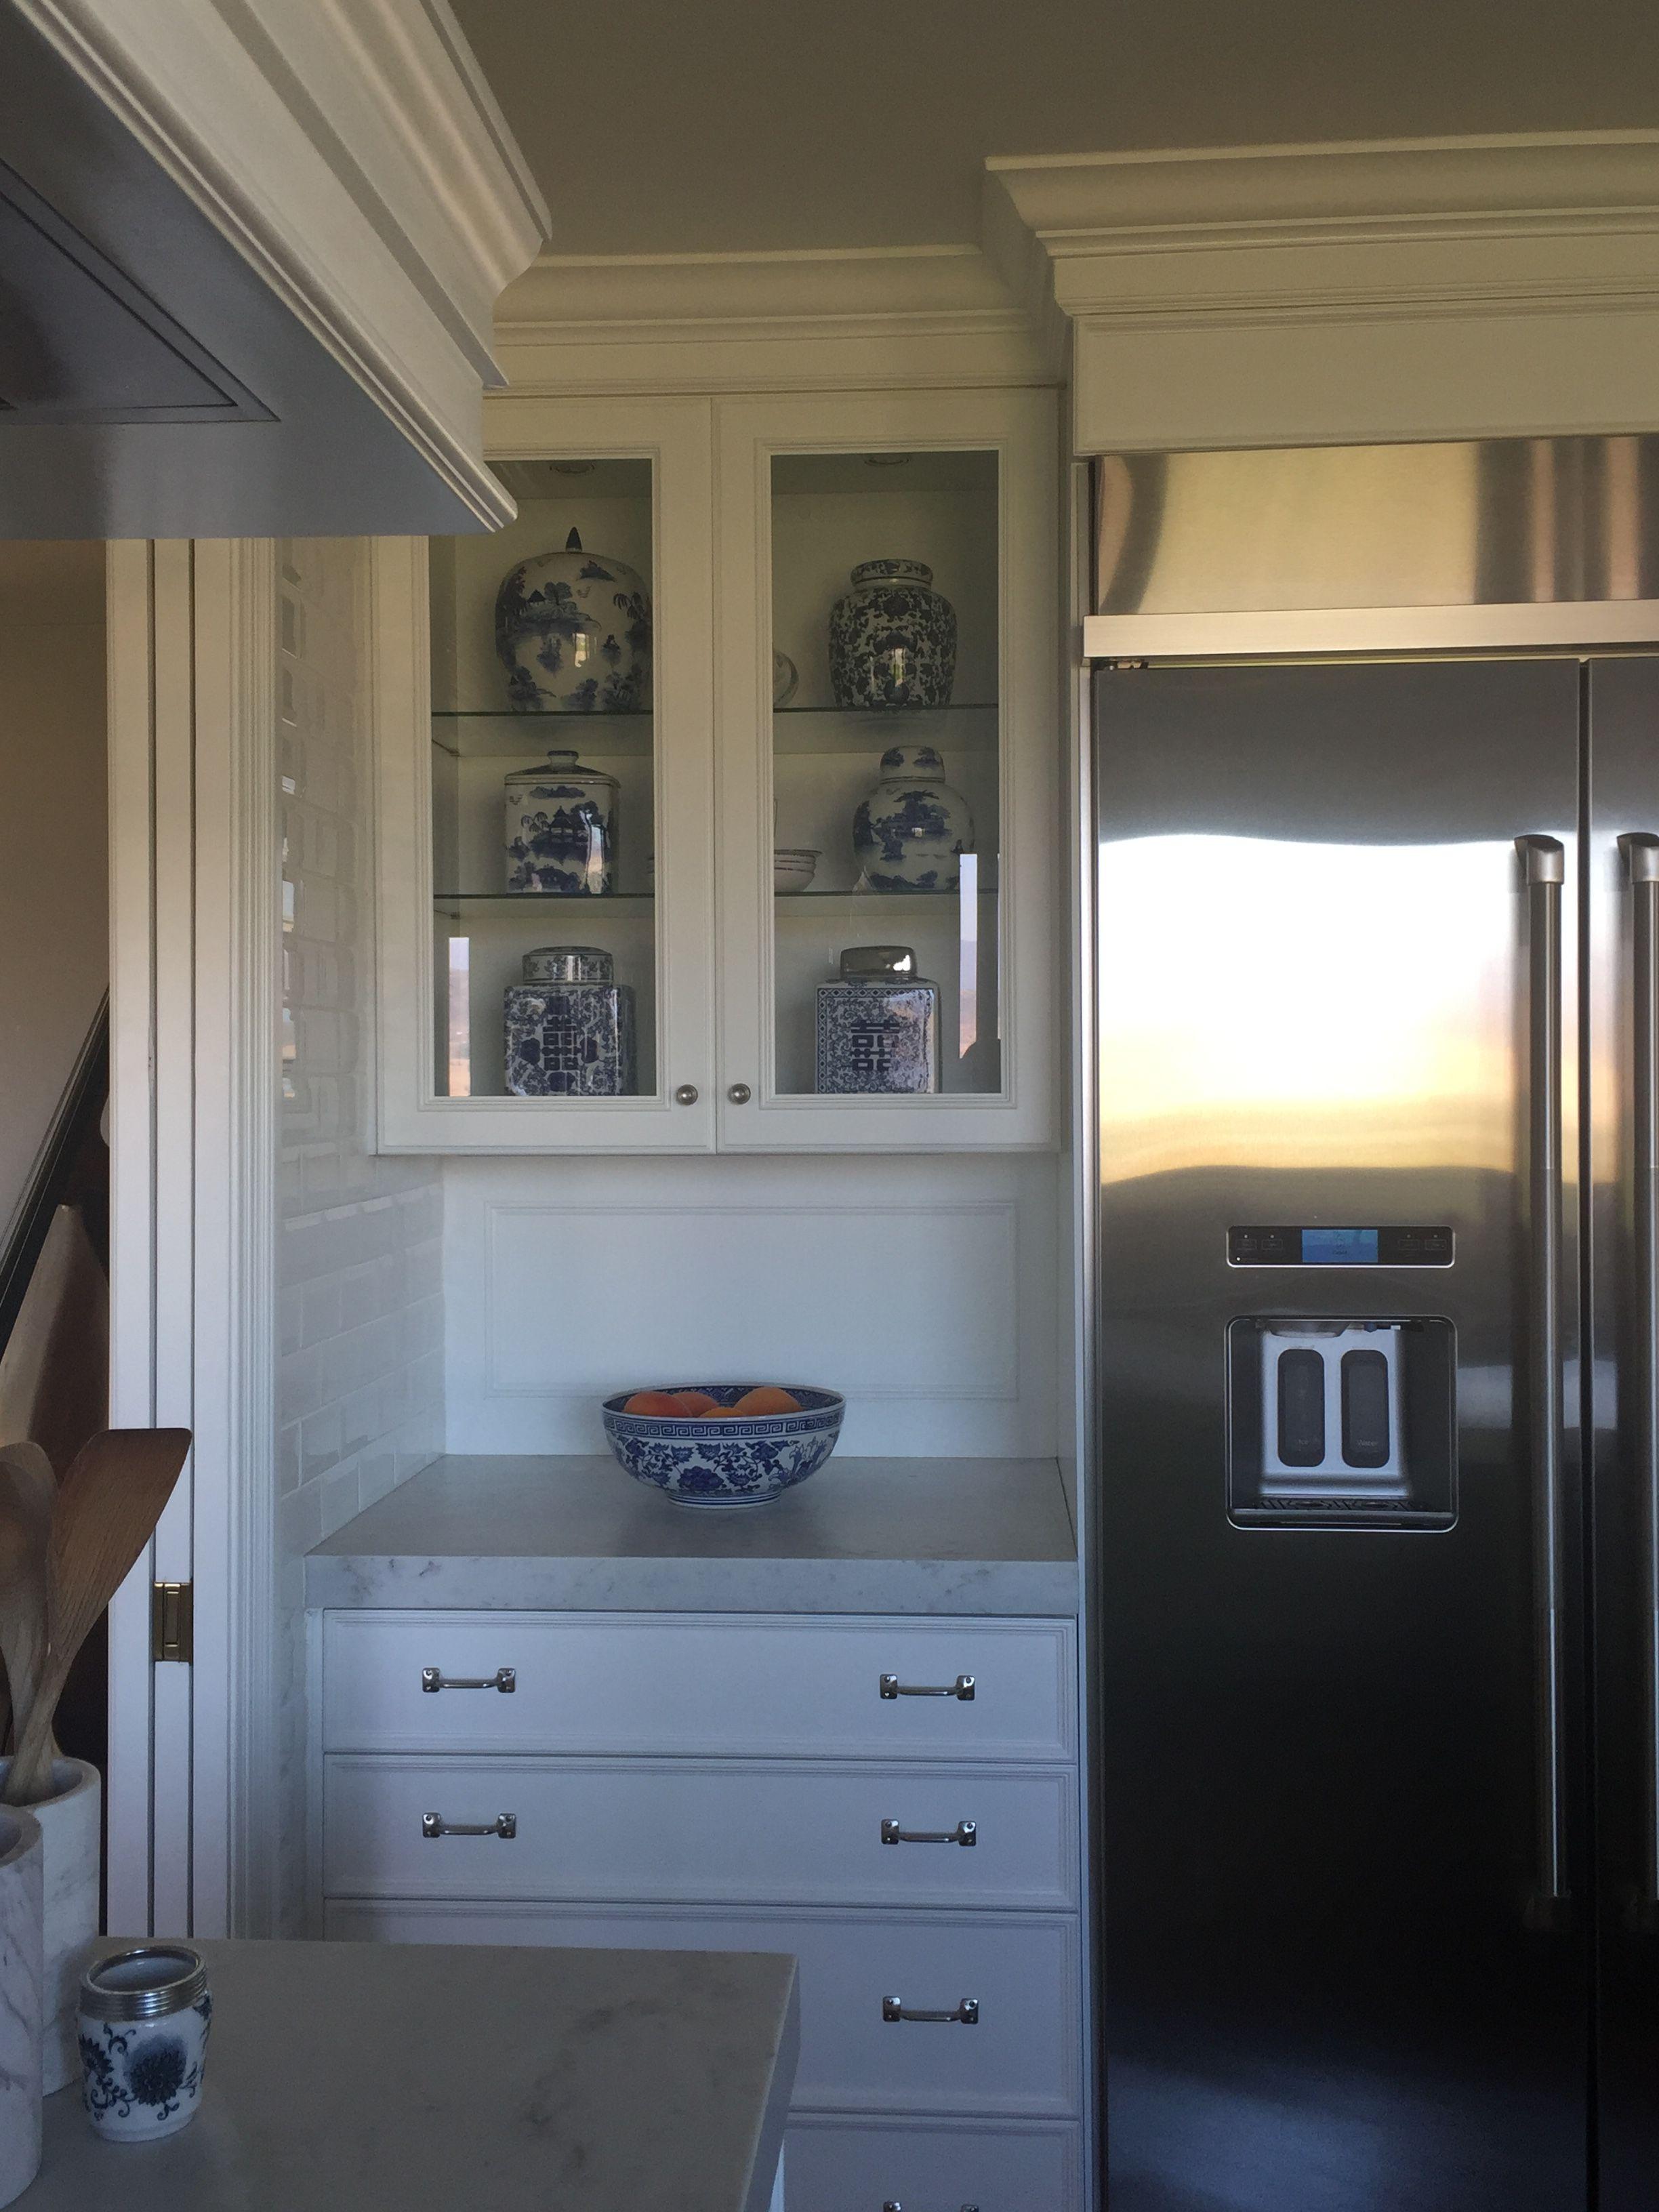 Tracy Bilello Tlb Designs Home Appliances Kitchen Cabinets Kitchen